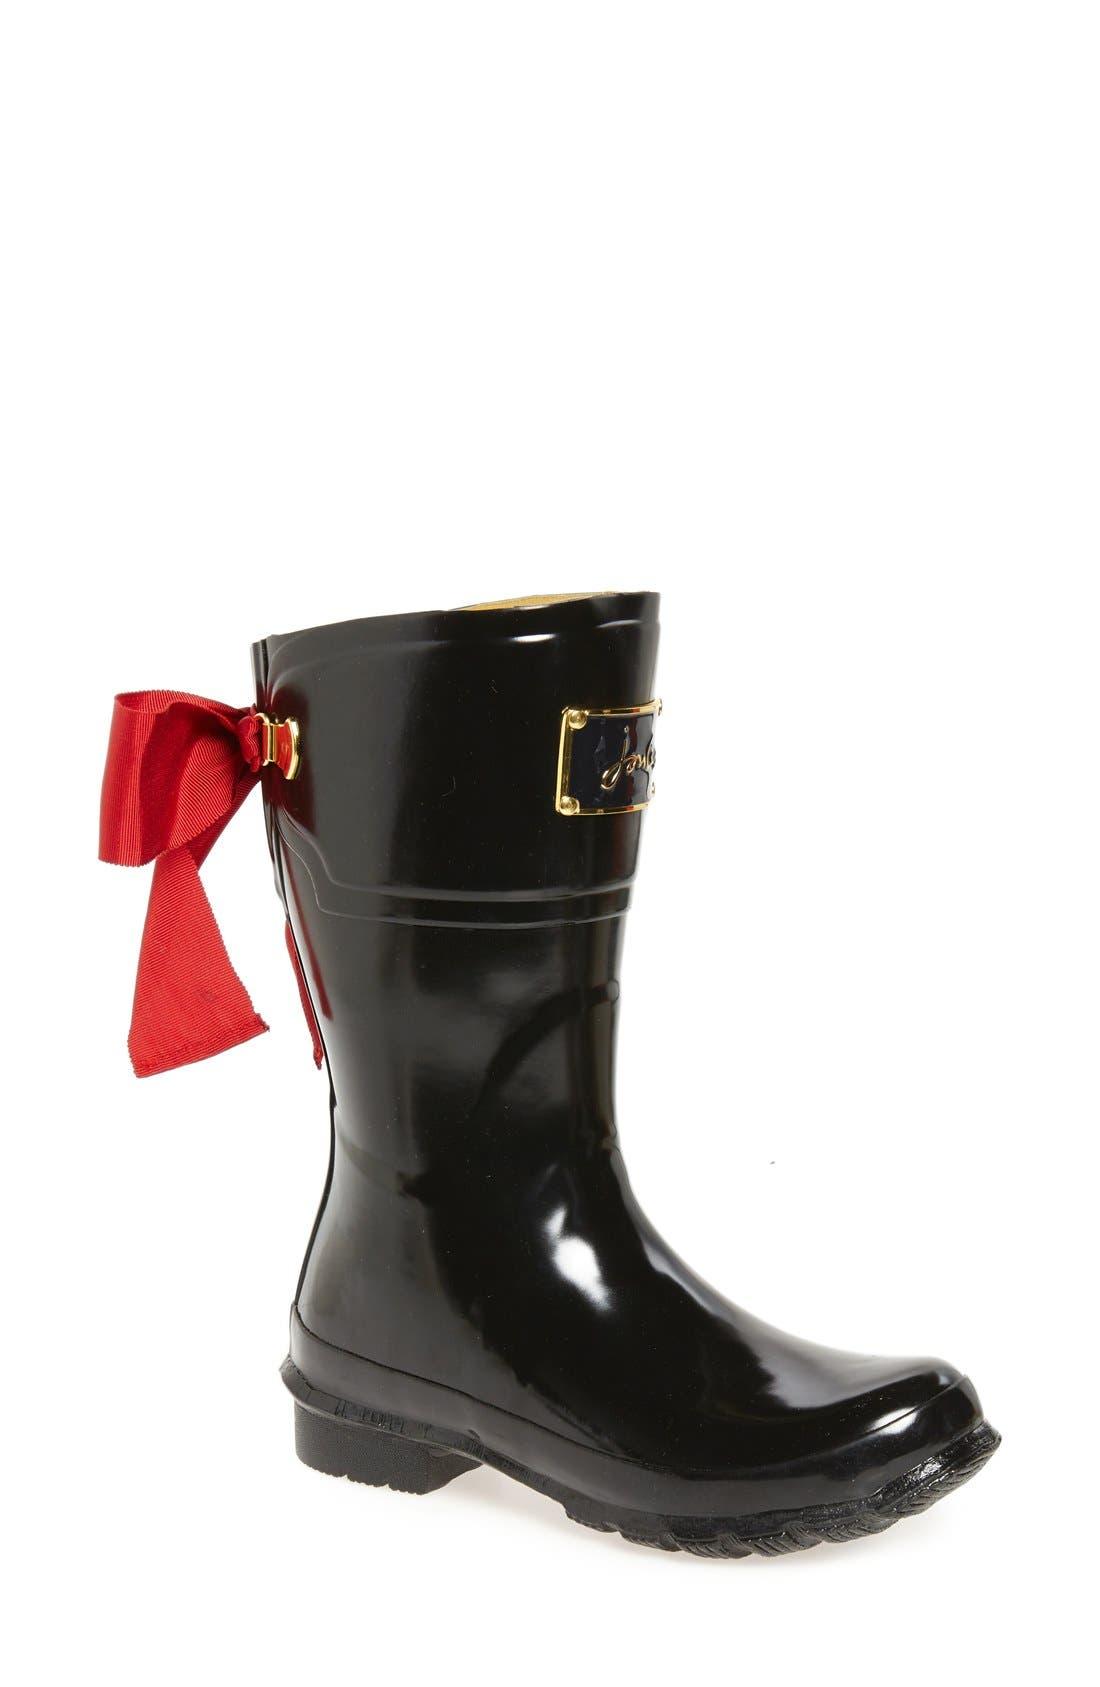 JOULES Evedon Short Rain Boot